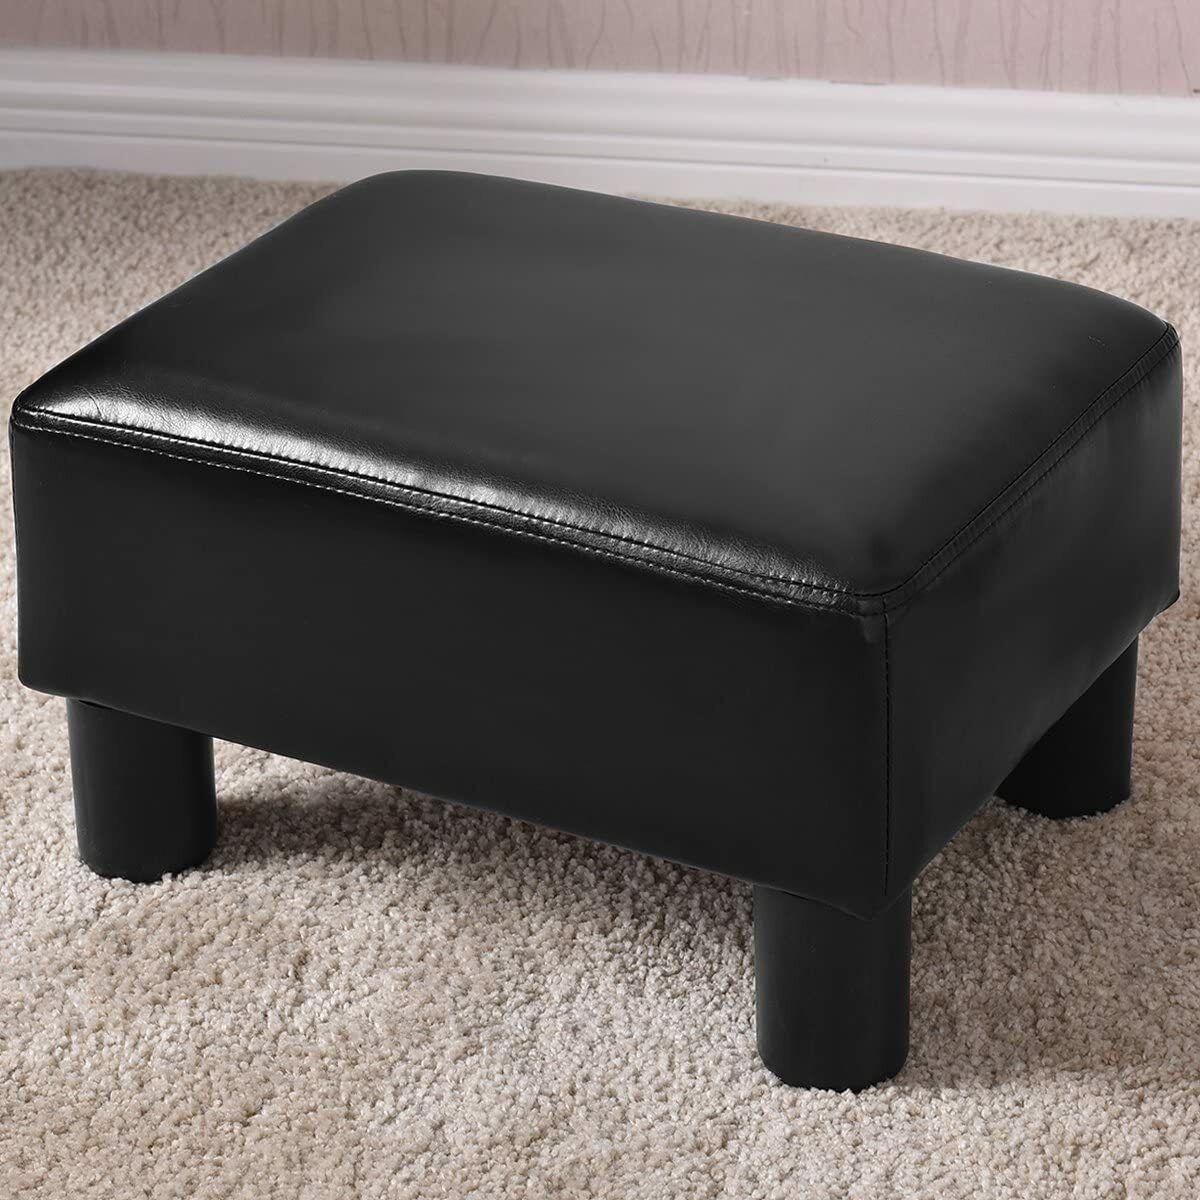 Fußhocker Sitzhocker Polsterhocker Fußschemel Sitzbank PU Bezug 40 x 30 x 24 cm